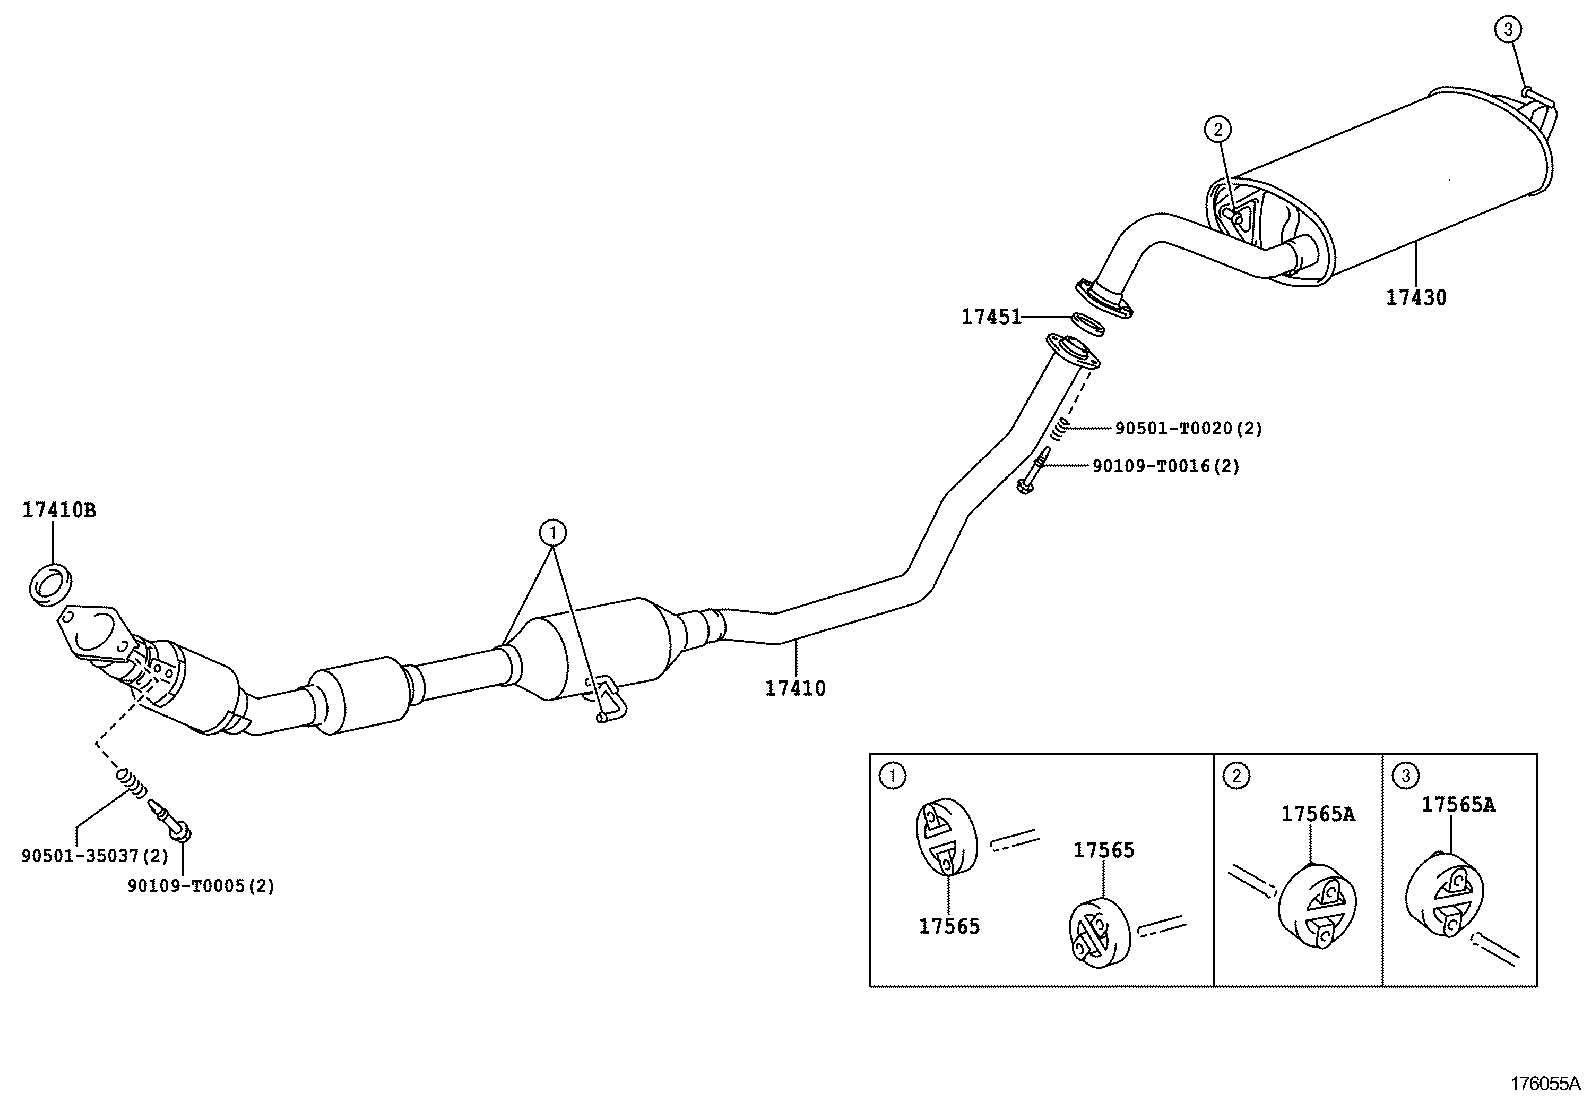 2000 pontiac grand prix radio wiring diagram furthermore toyota